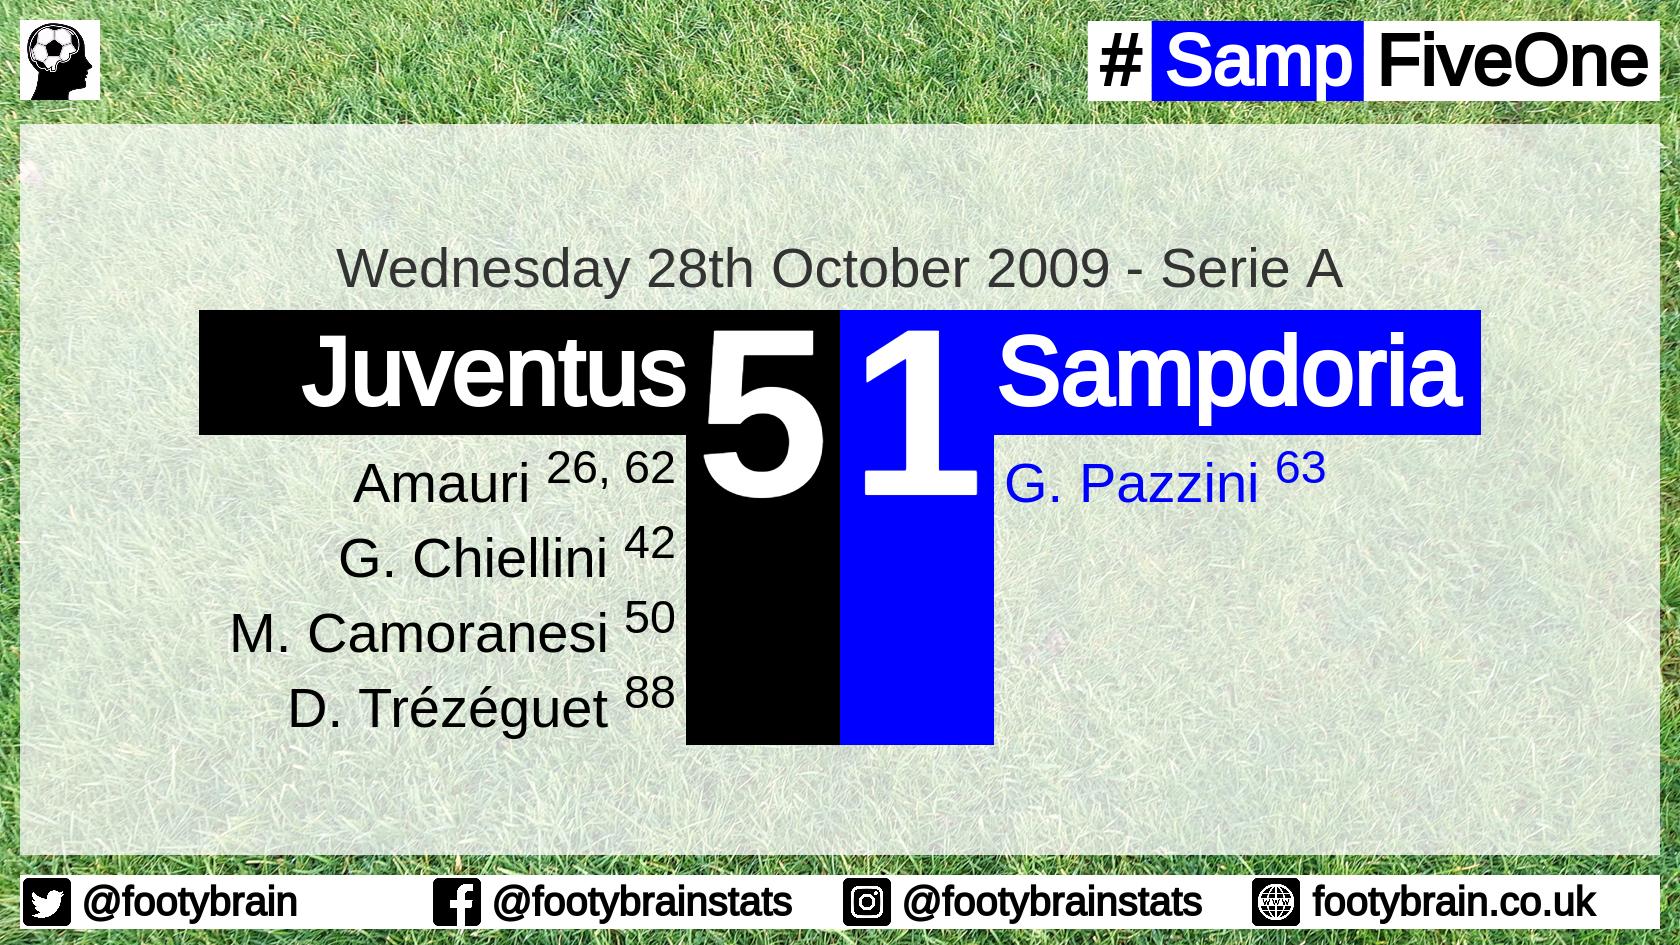 Juventus 5 Sampdoria 1, 2009